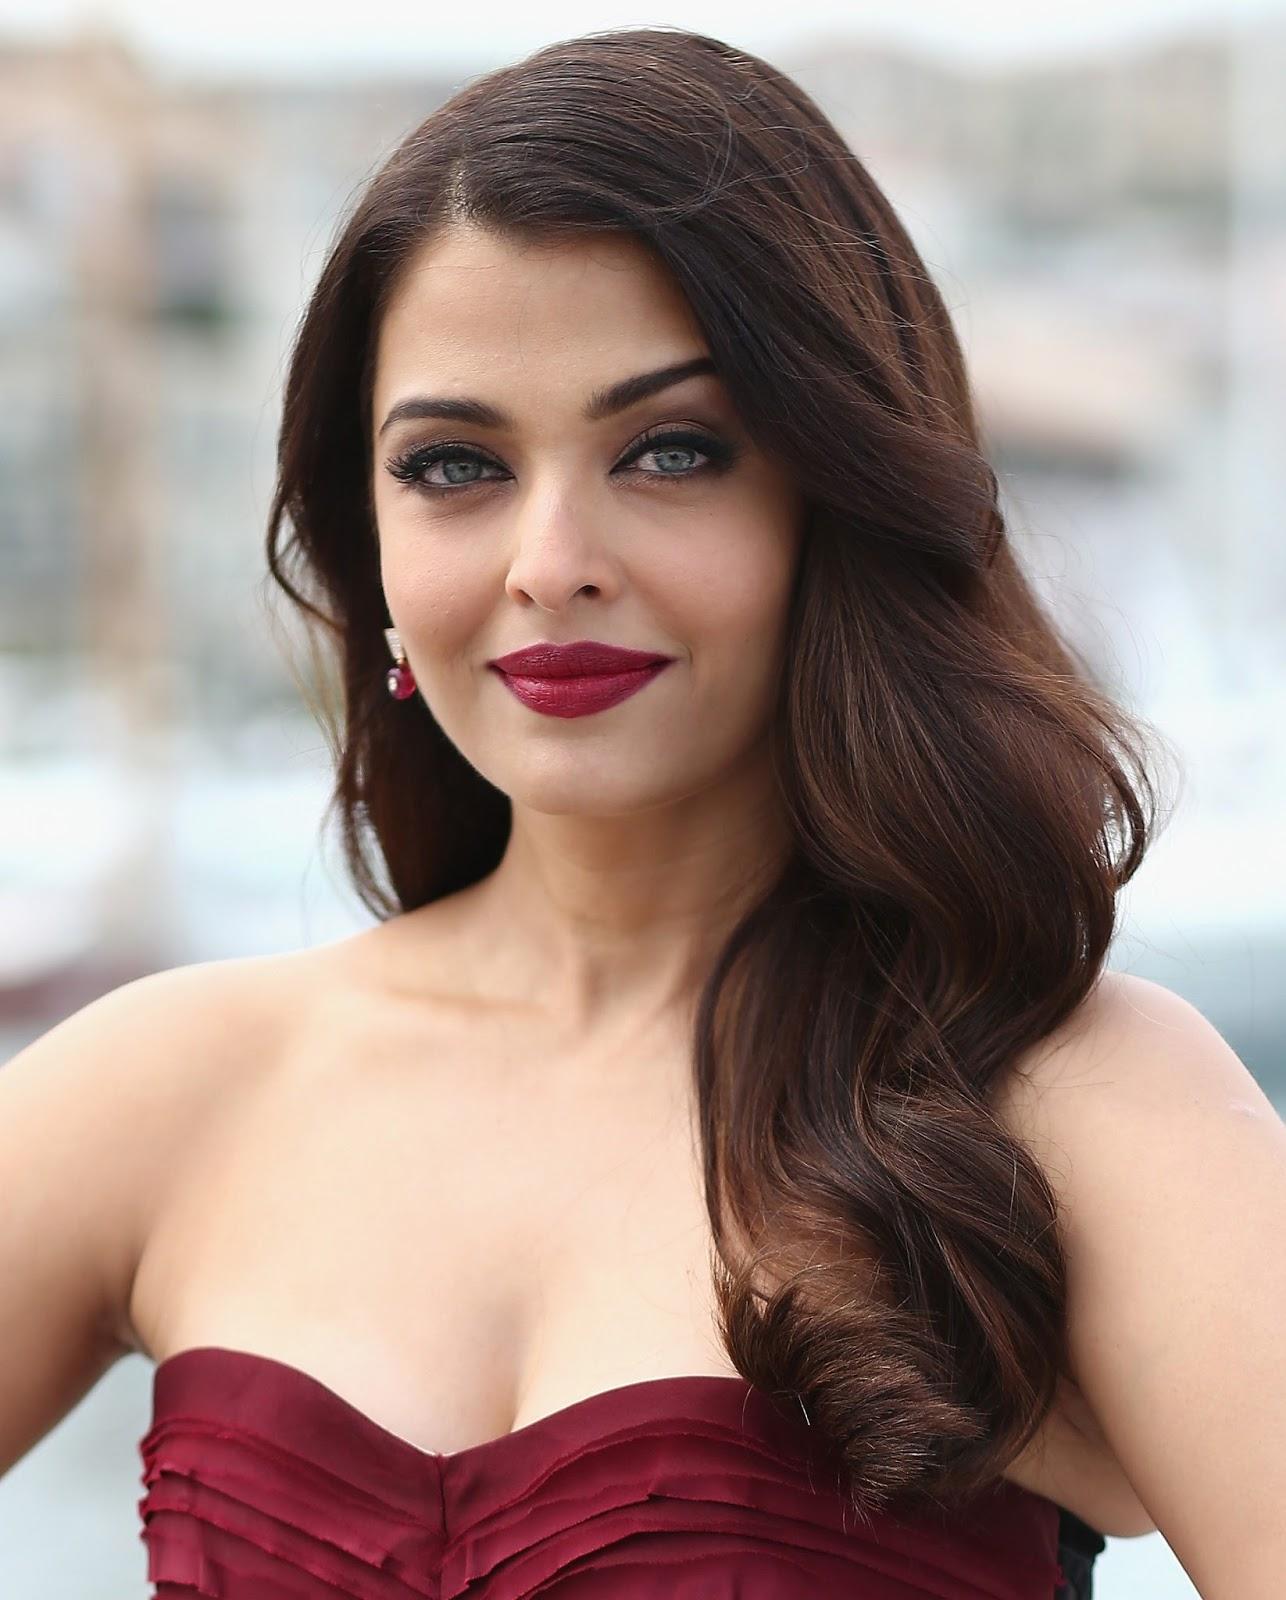 Indian actress profiles: Aishwarya Rai Bachchan